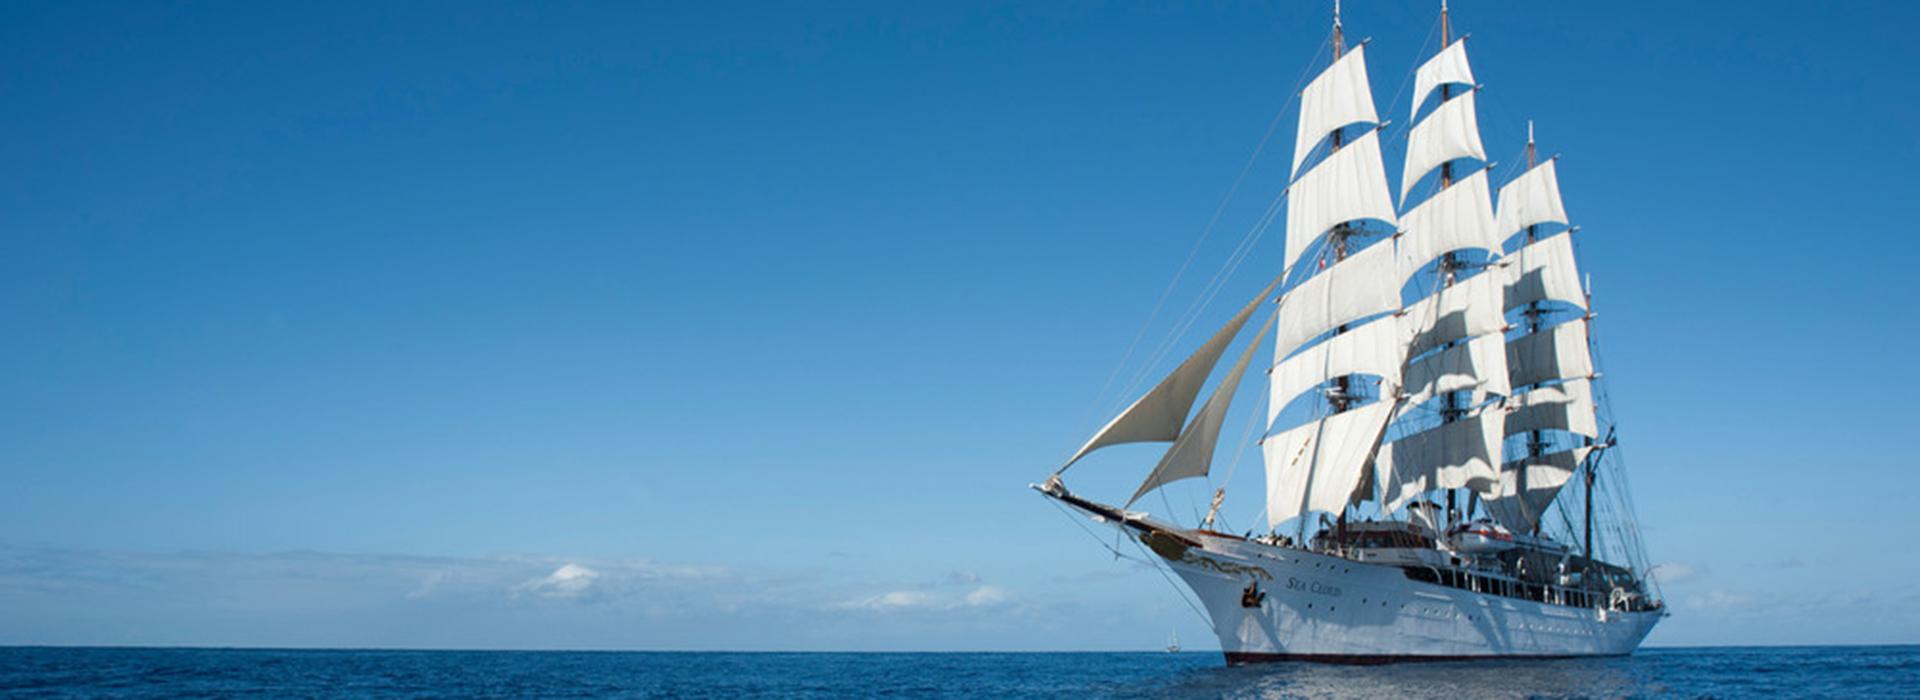 Segelschiff Sea Cloud auf See